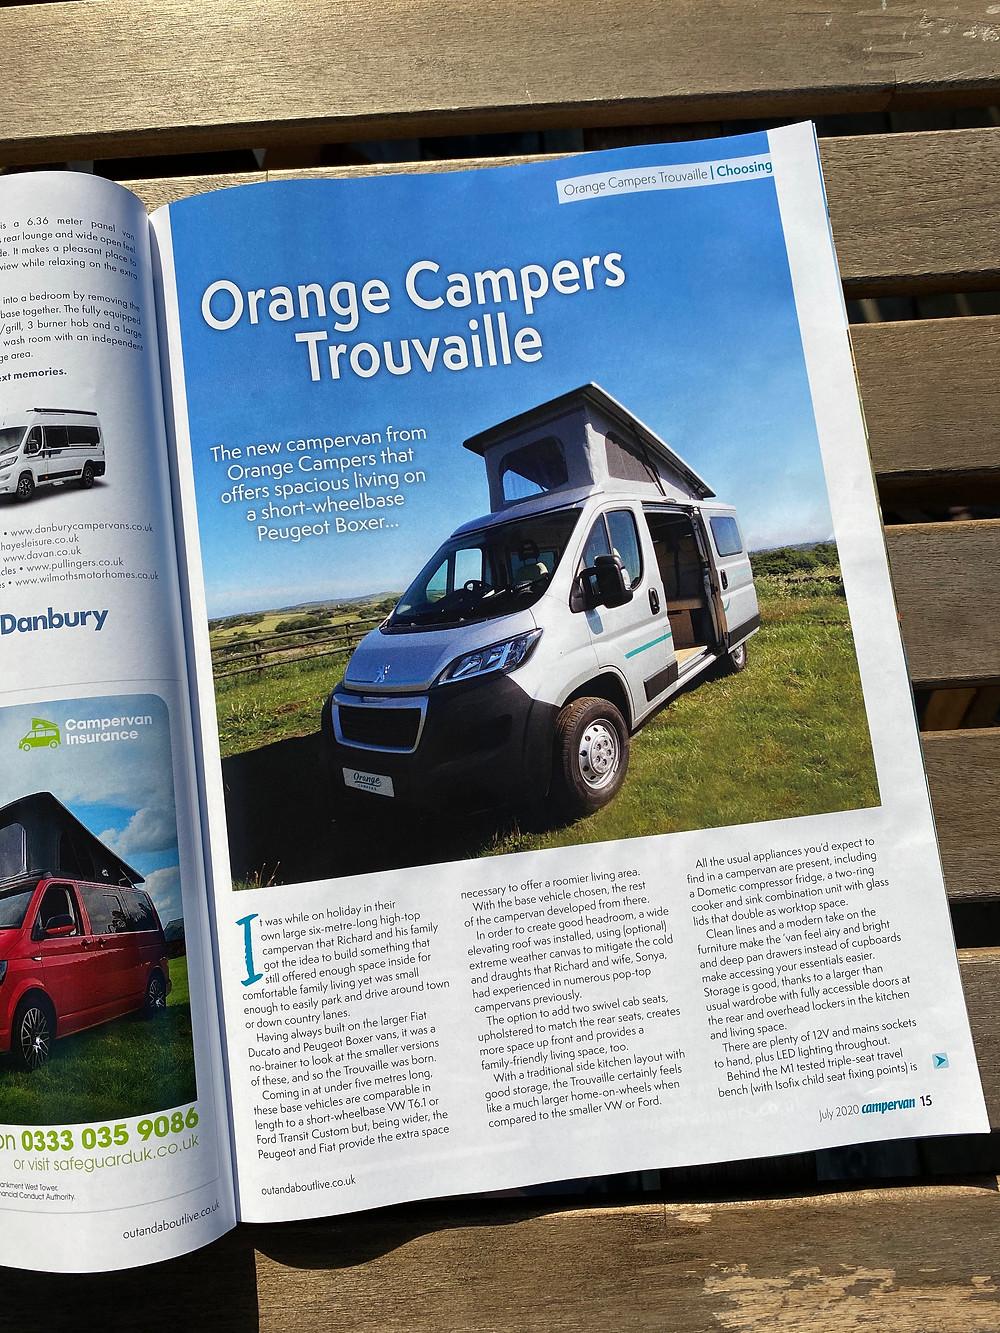 Trouvaille Campervan Peugeot Conversion for Sale Sheffield Yorkshire